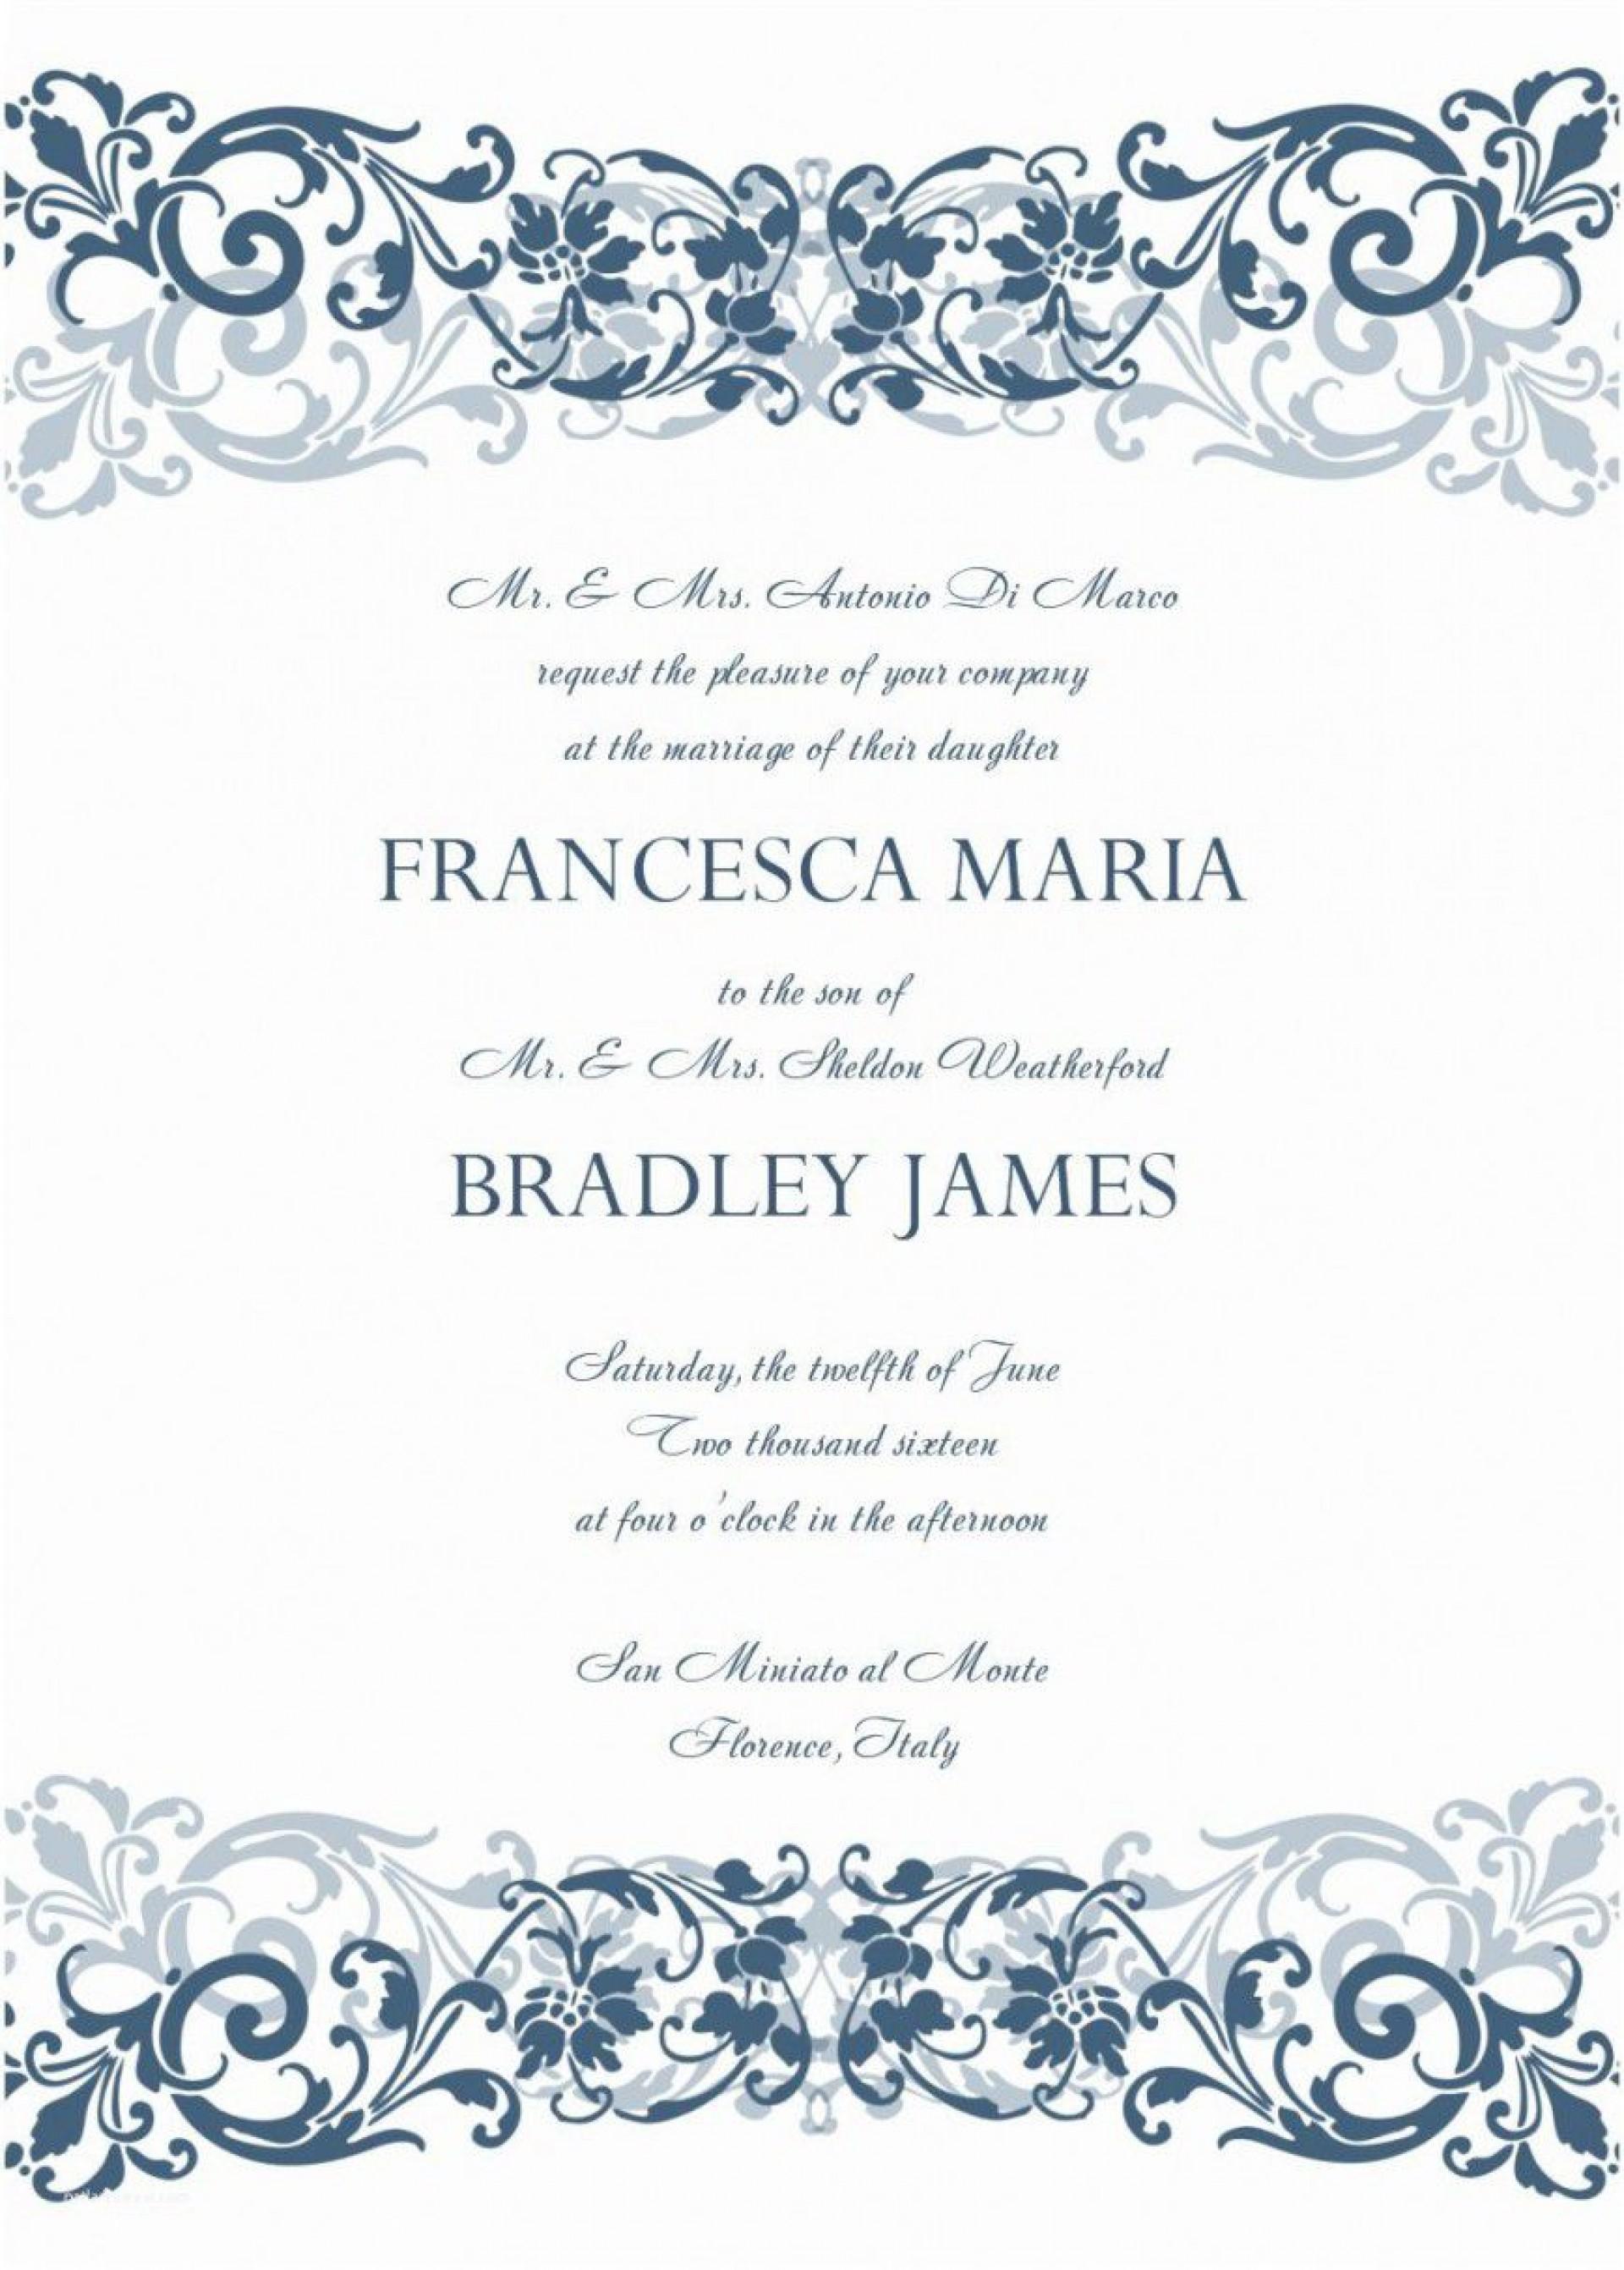 001 Phenomenal M Word Invitation Template Photo  Microsoft Card Wedding Free Download Editable1920